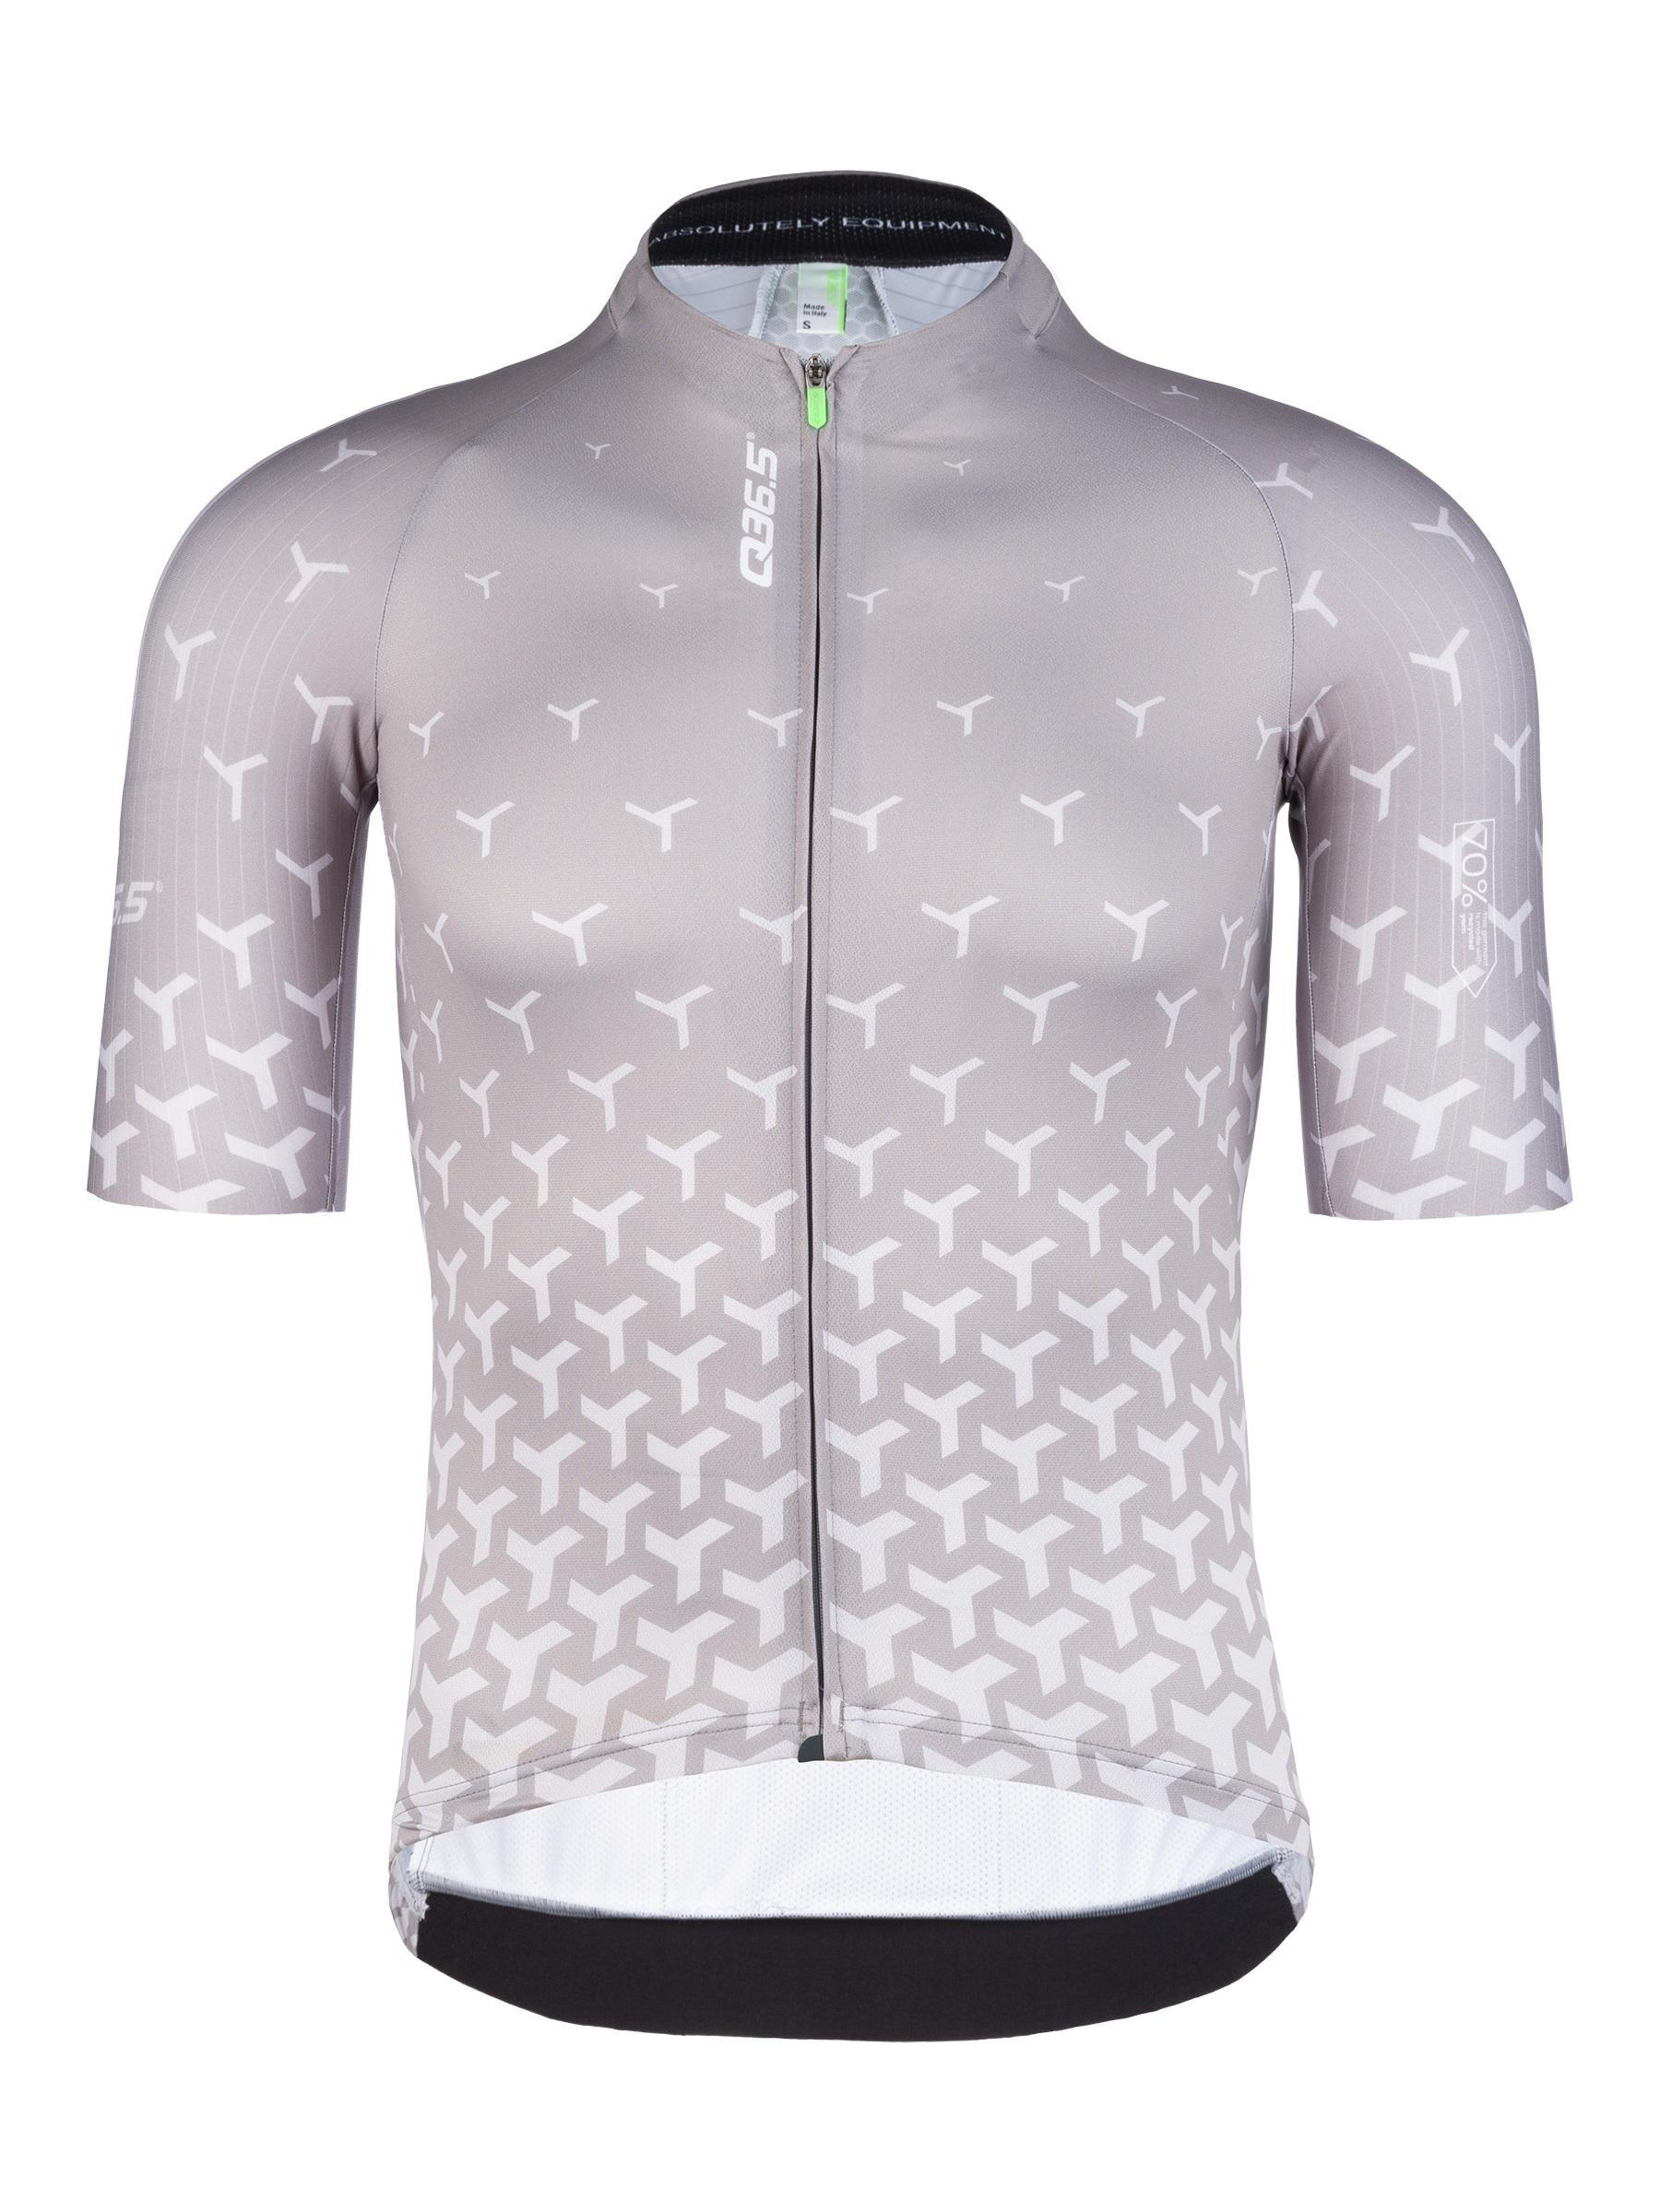 mens-cycling-jersey-r2-y-light-grey-031Y.16_front